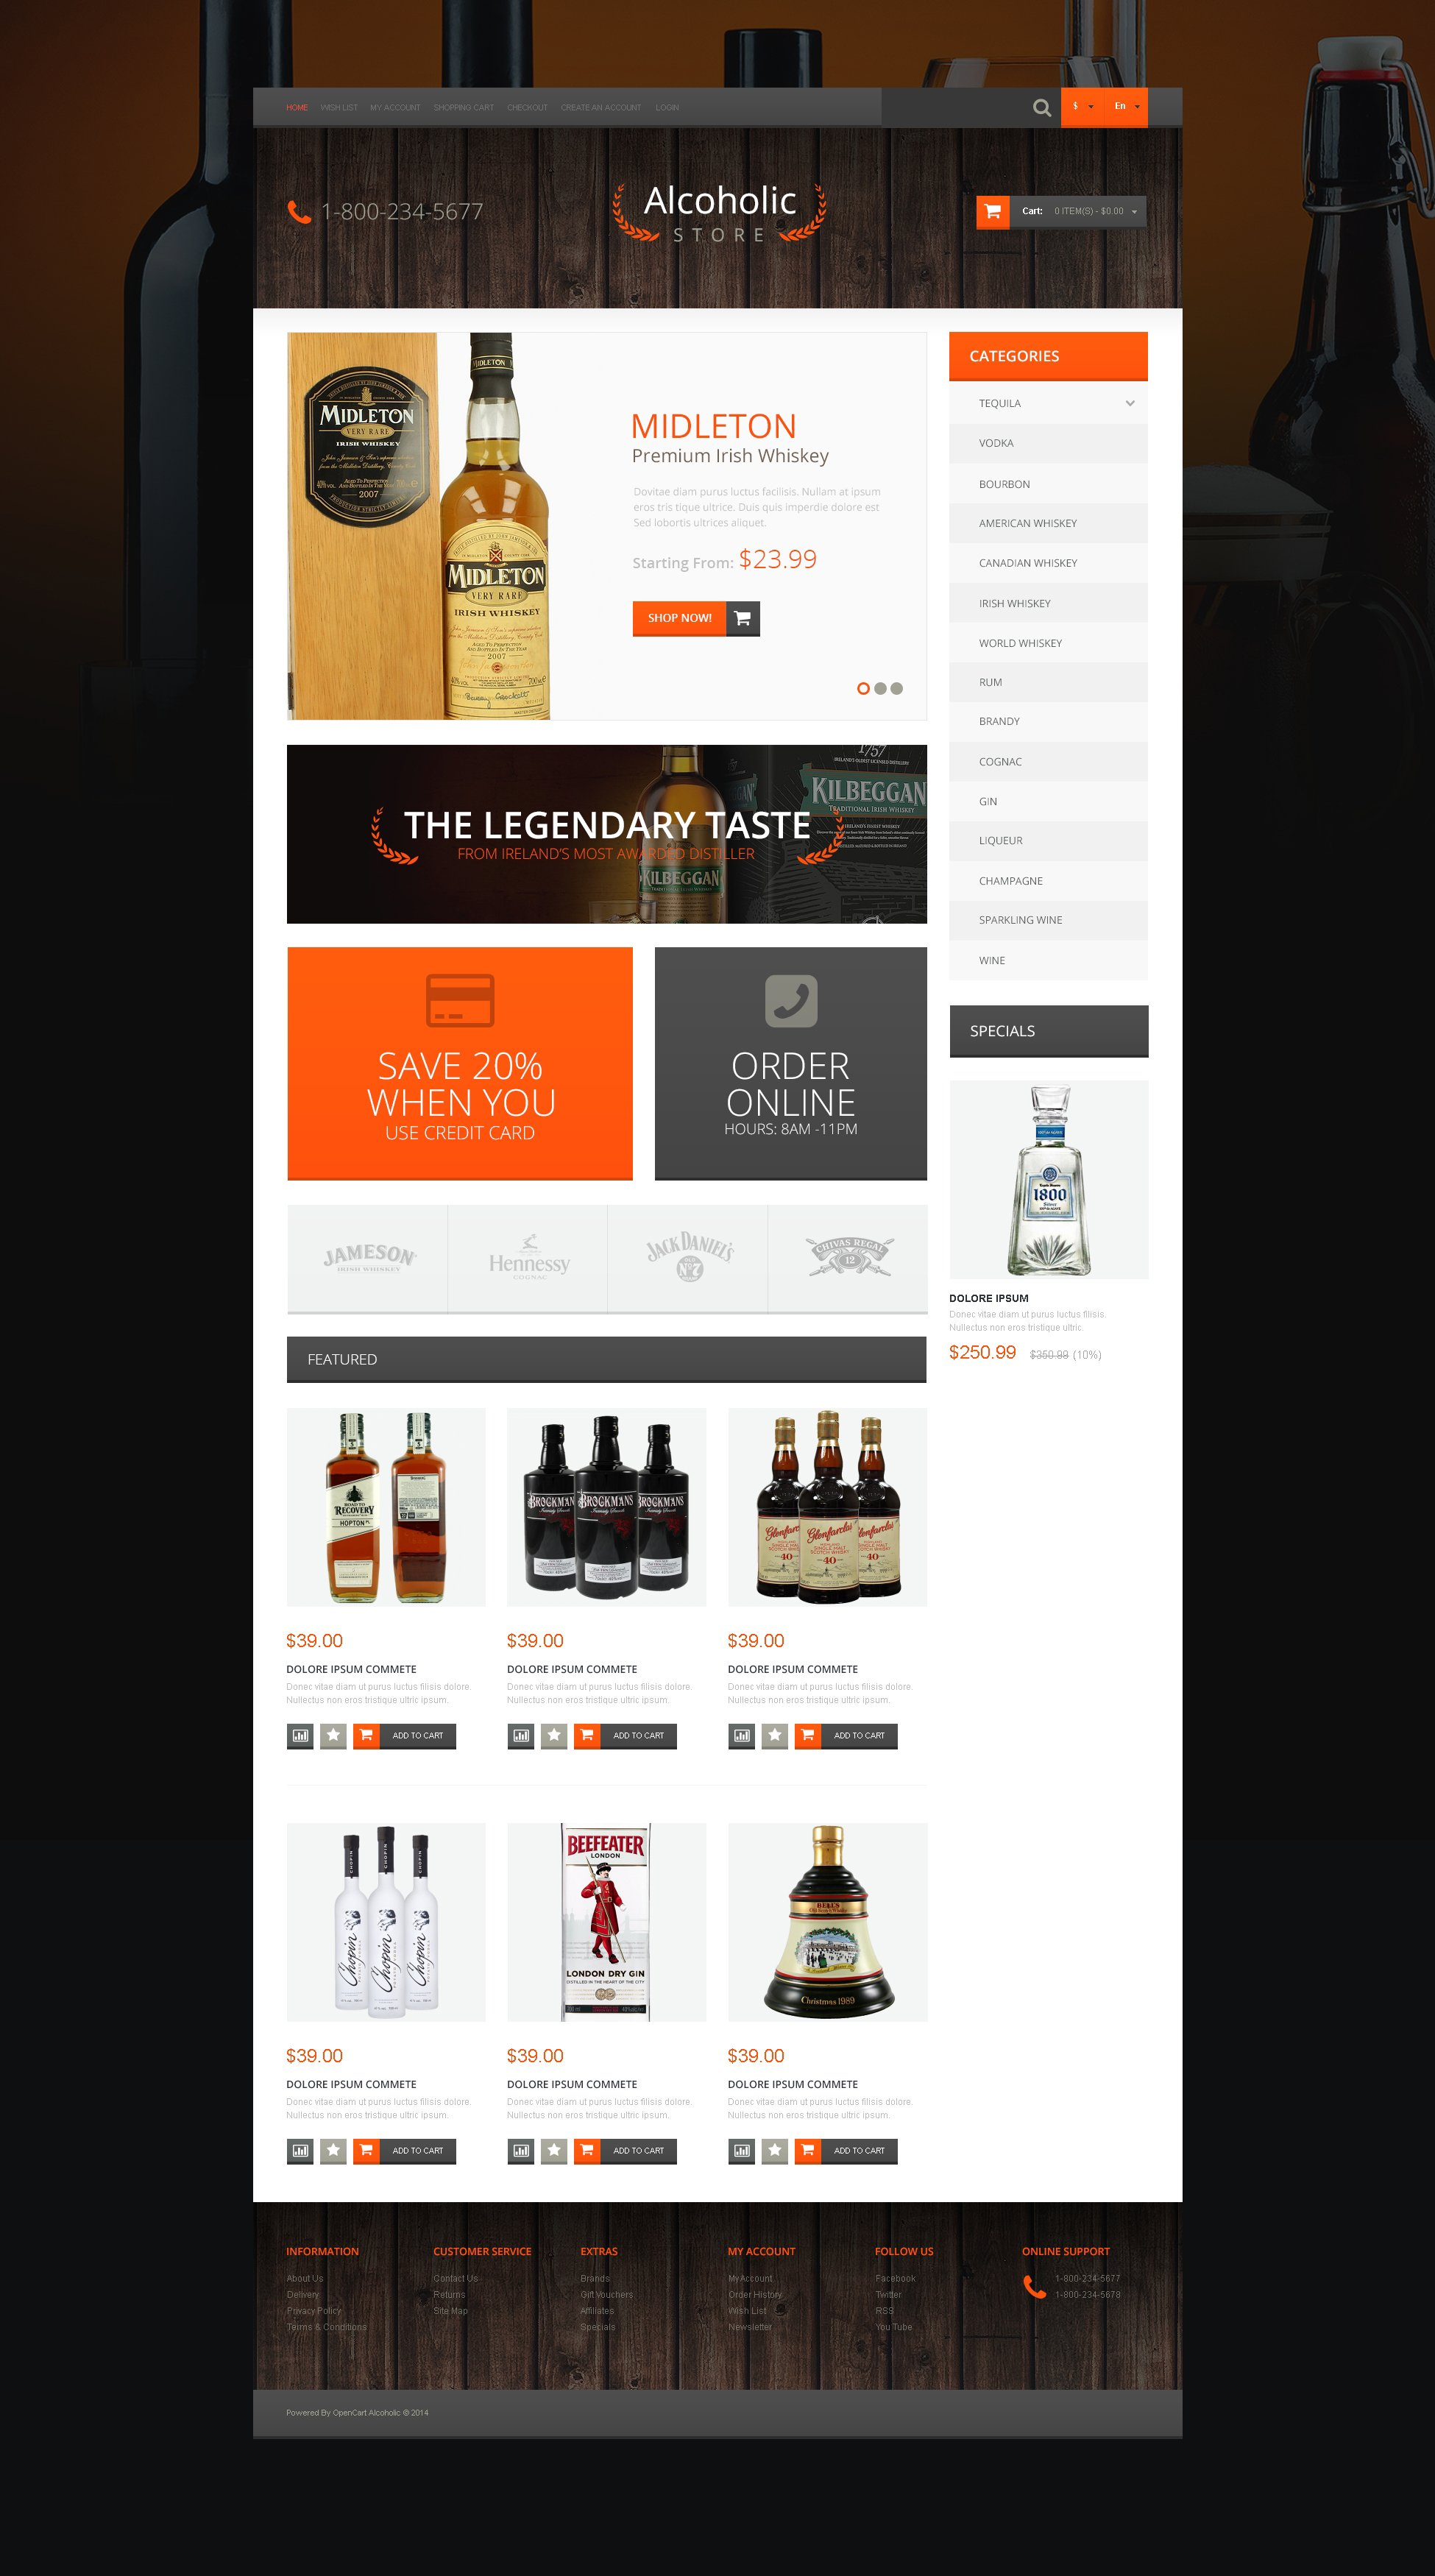 Liquor alcohol store or bar logo template vector image.